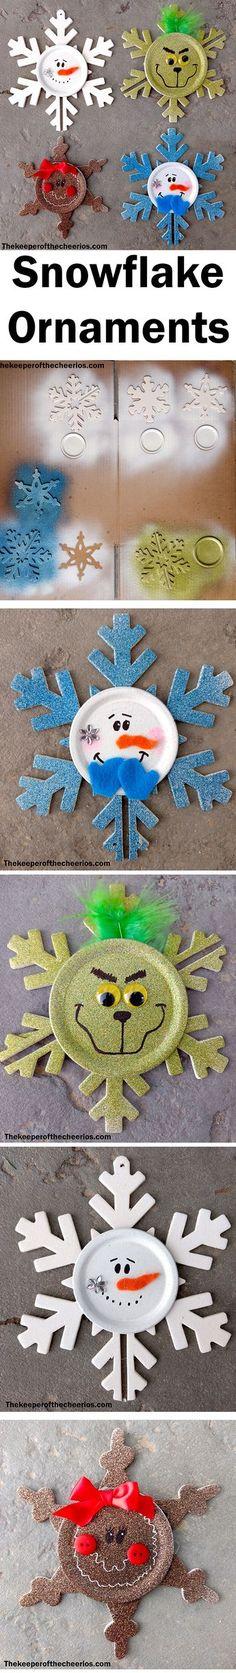 Snowflake Christmas Ornaments